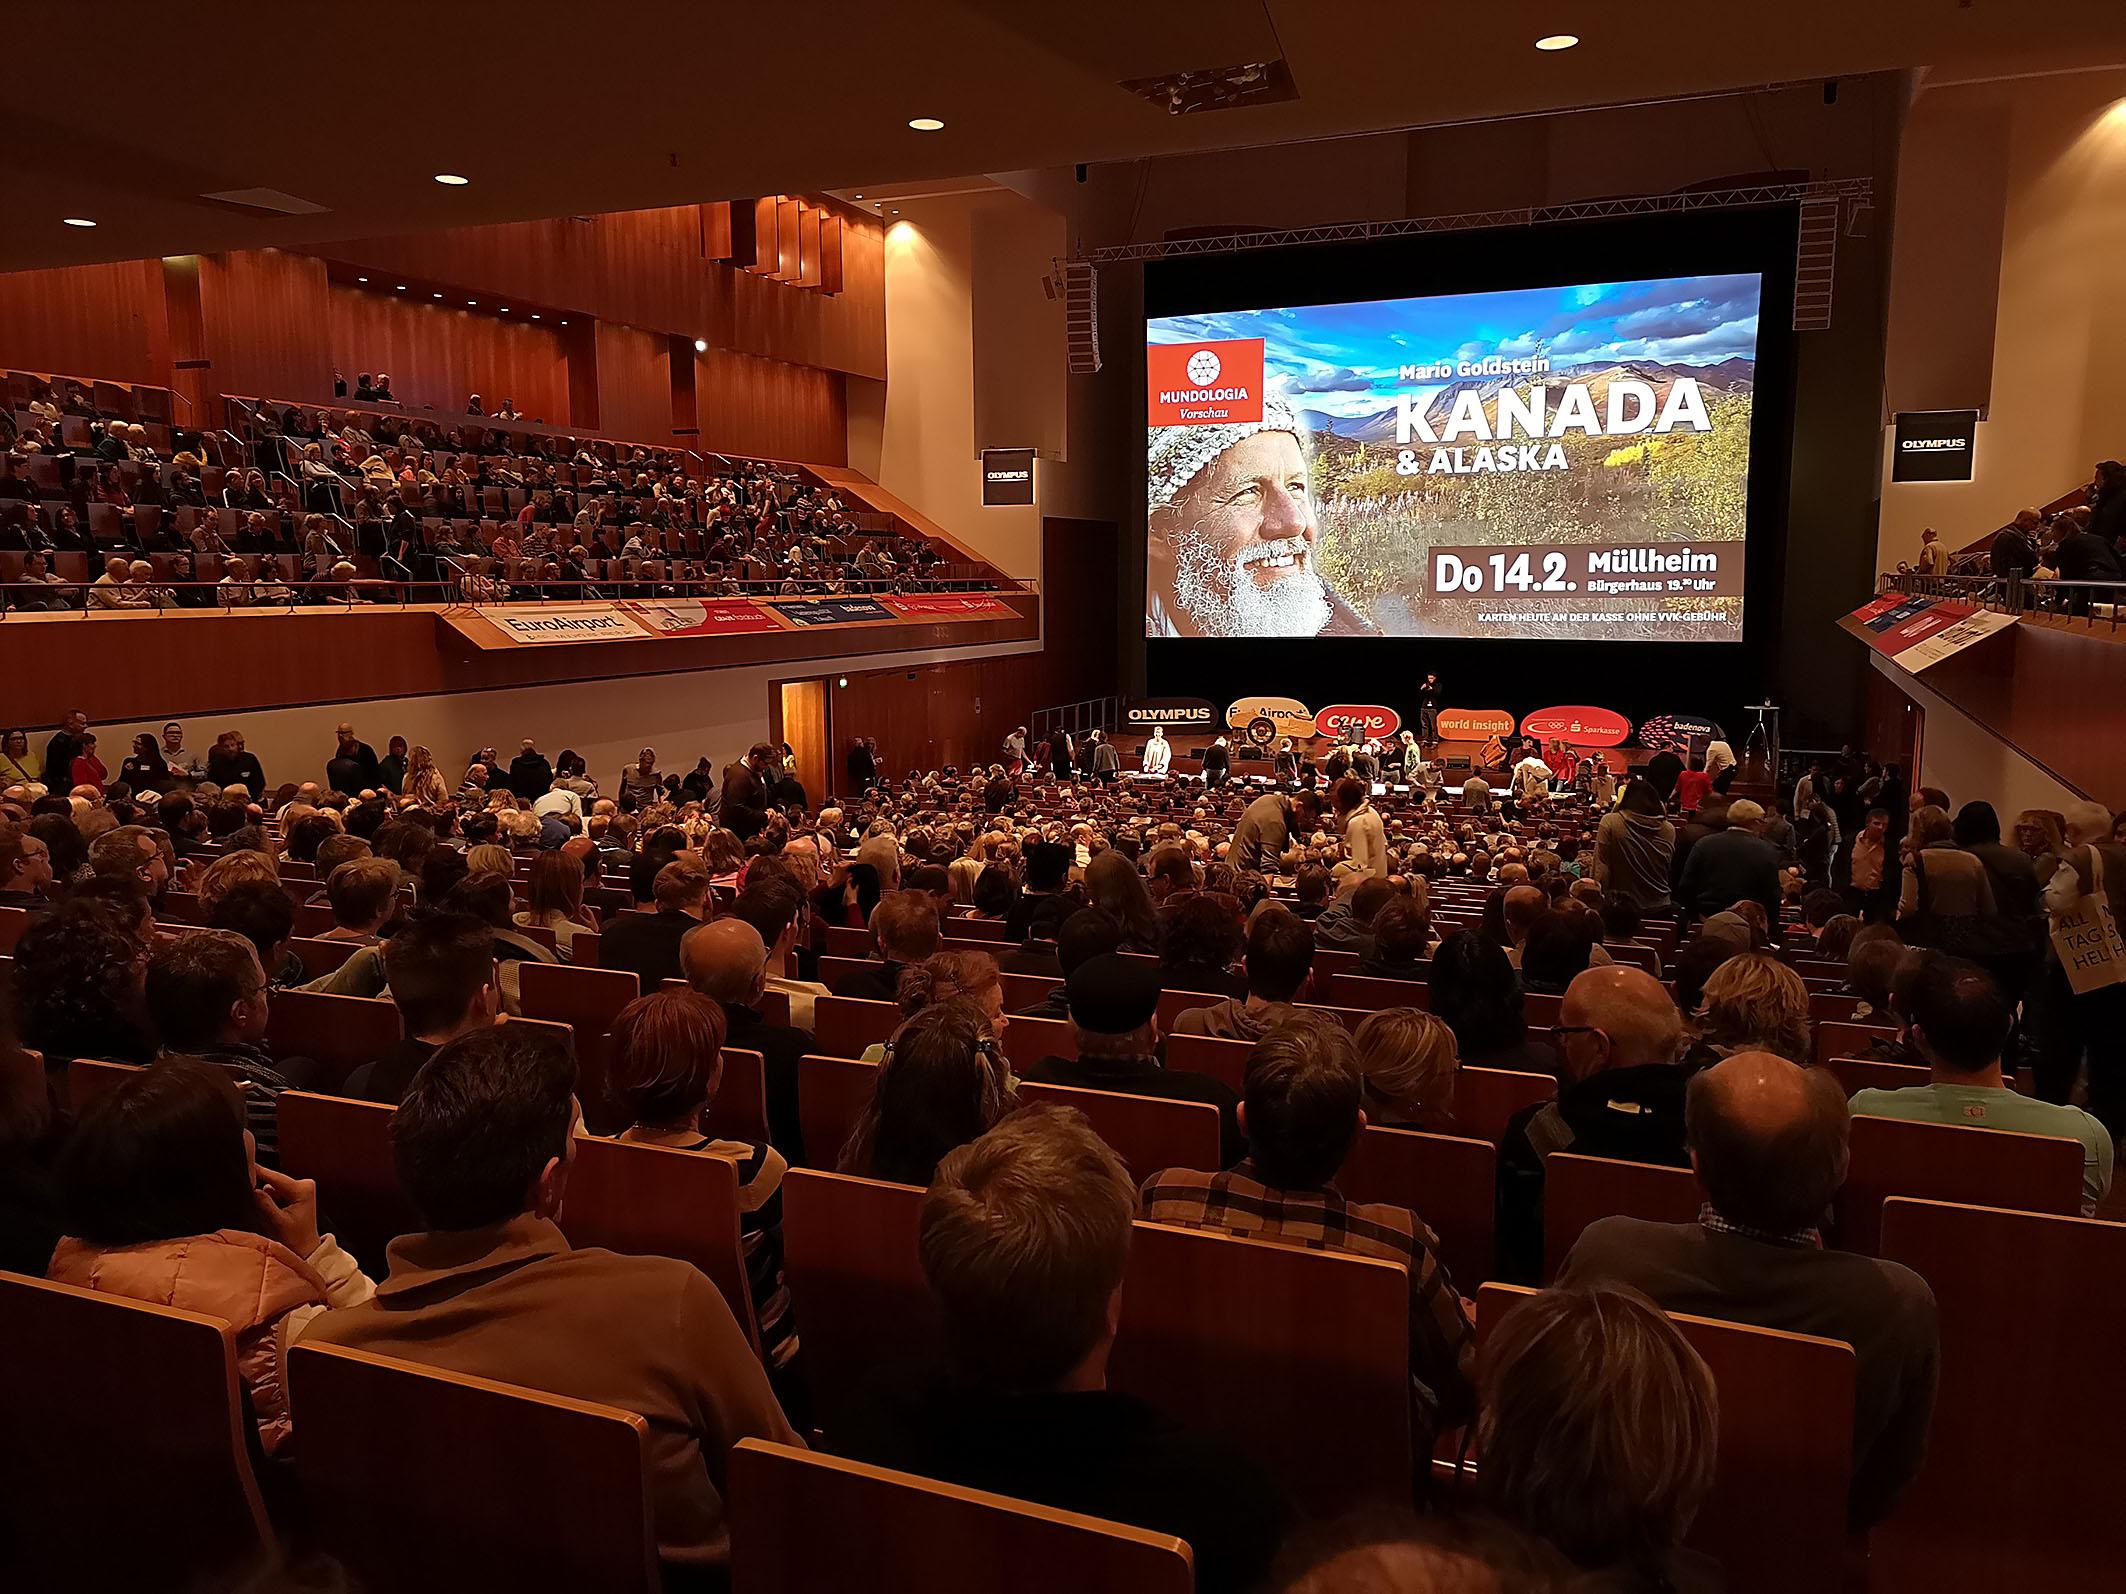 Foto: Michael B. Rehders - Der große Konzertsaal war bei fast jedem Reisevortrag ausverkauft.